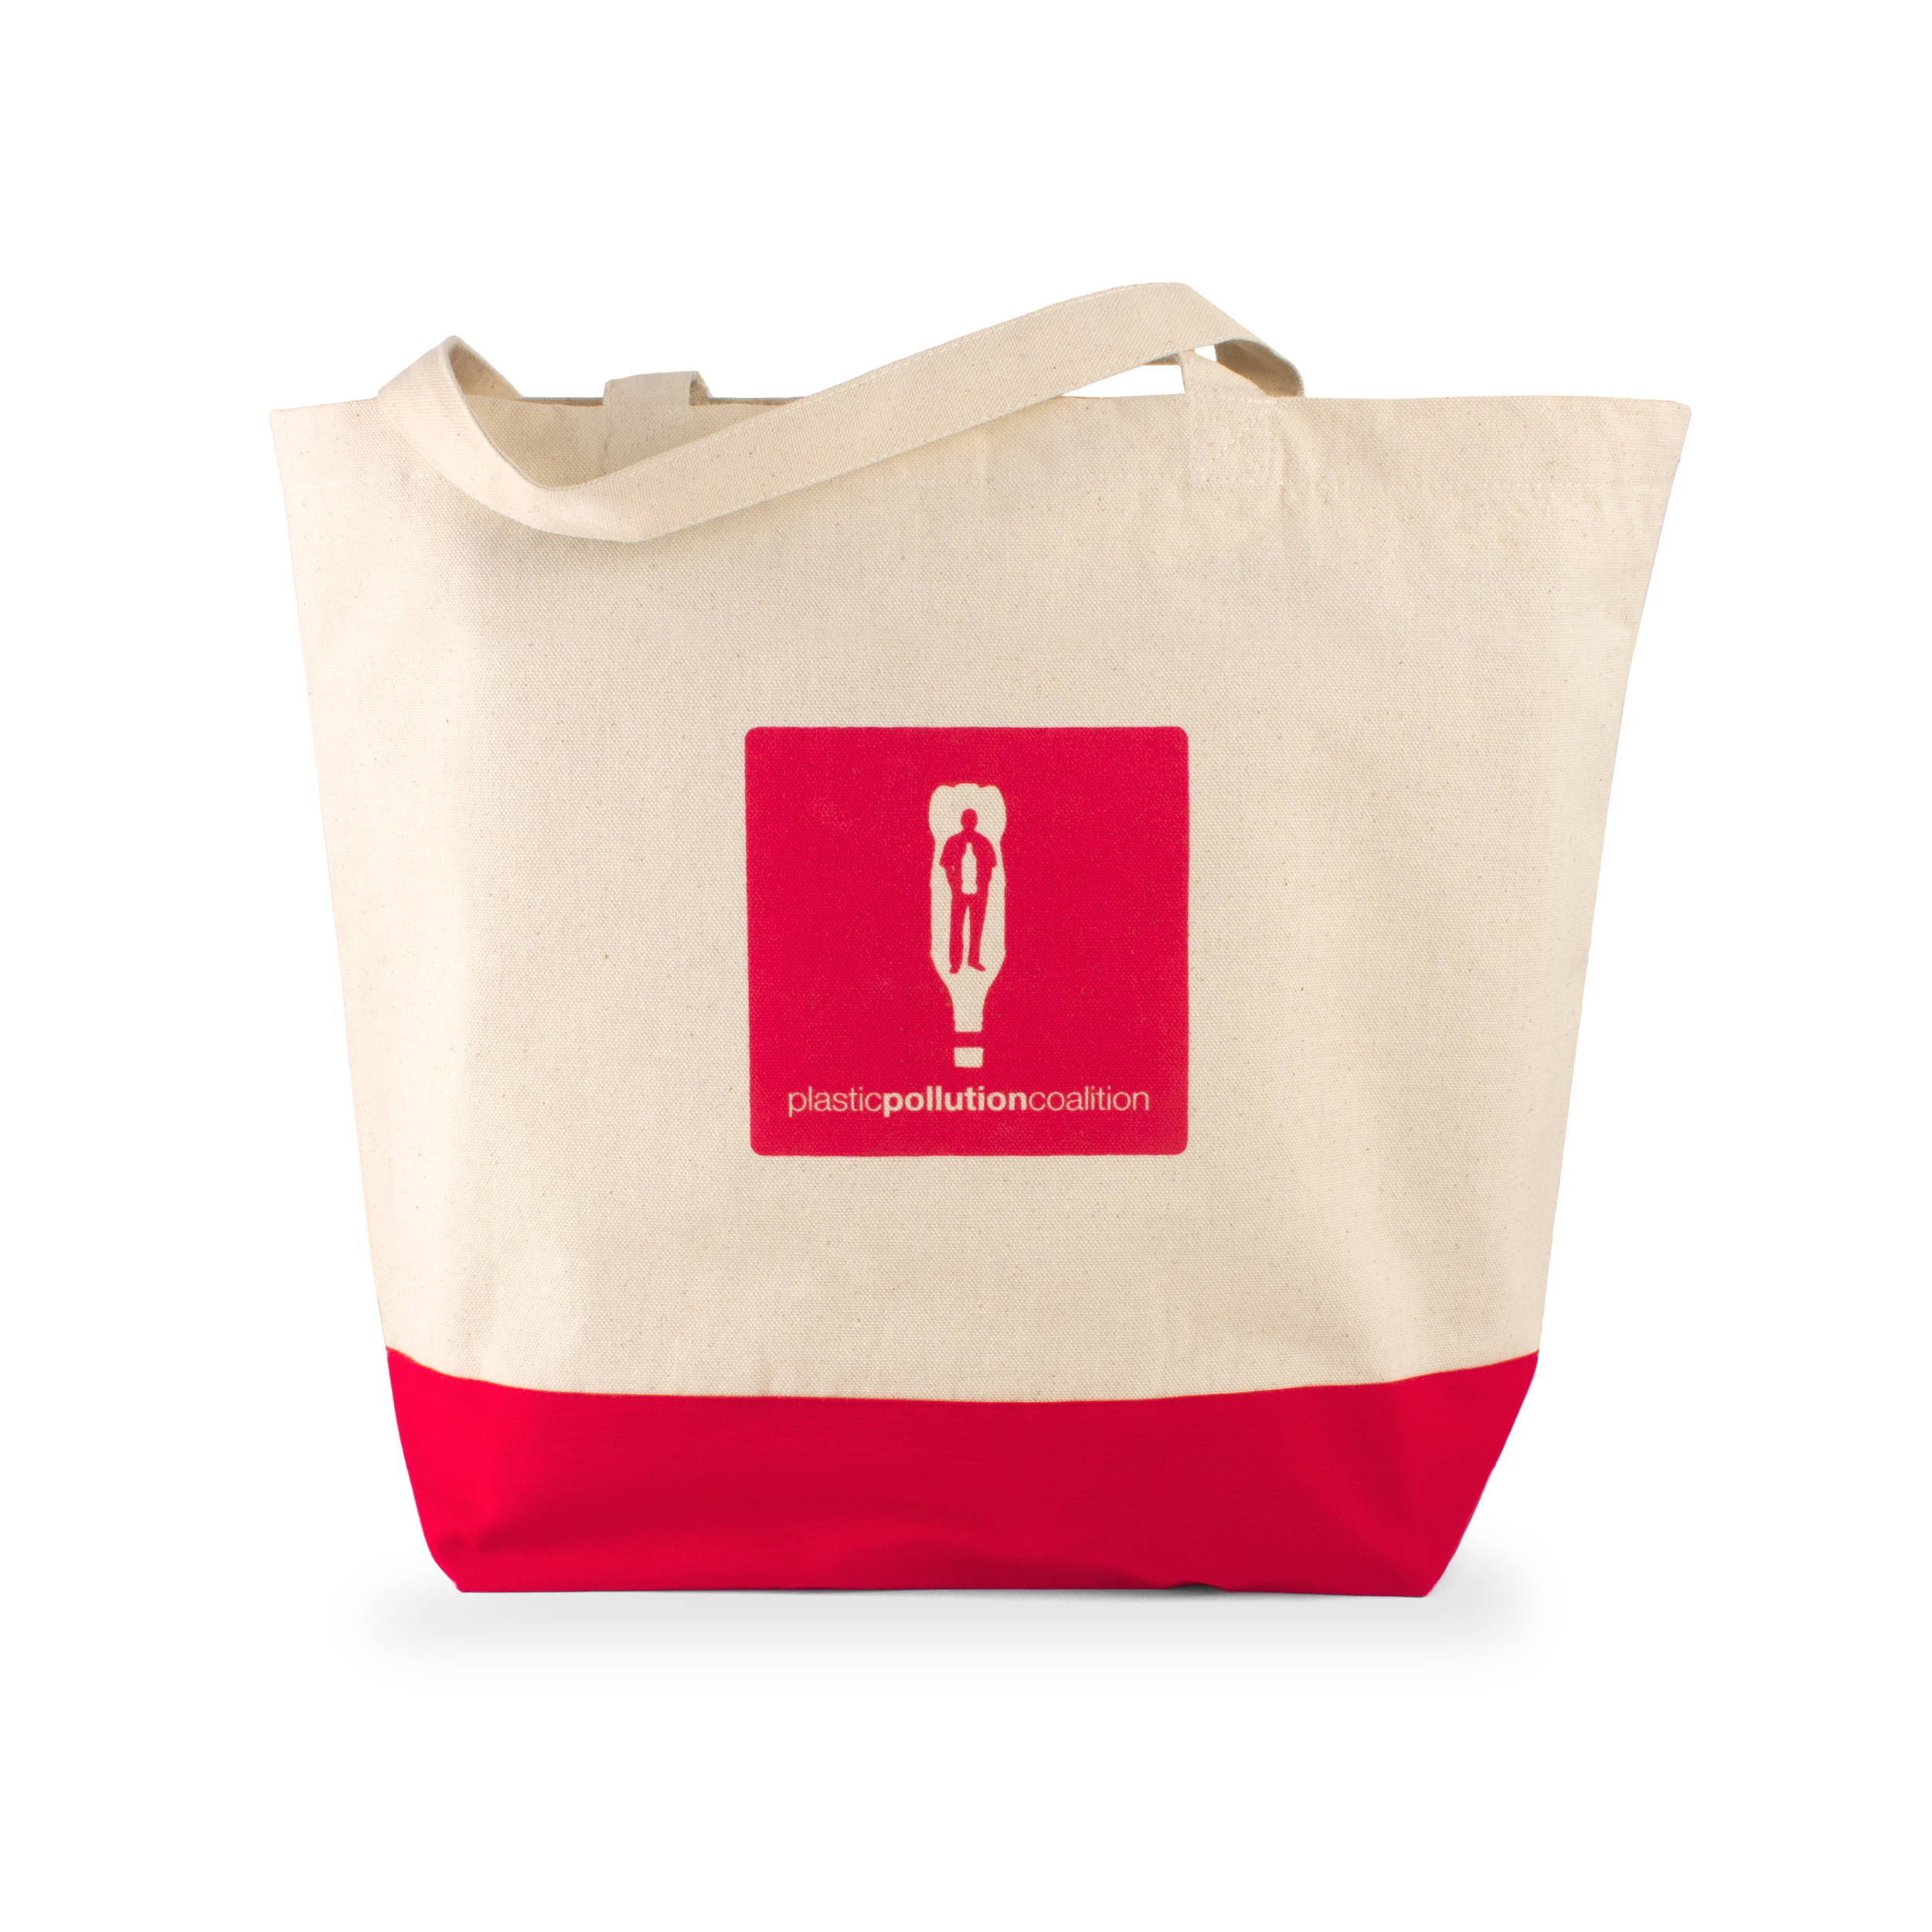 15.09.18-PPC-tote-bags-079 (1).jpg